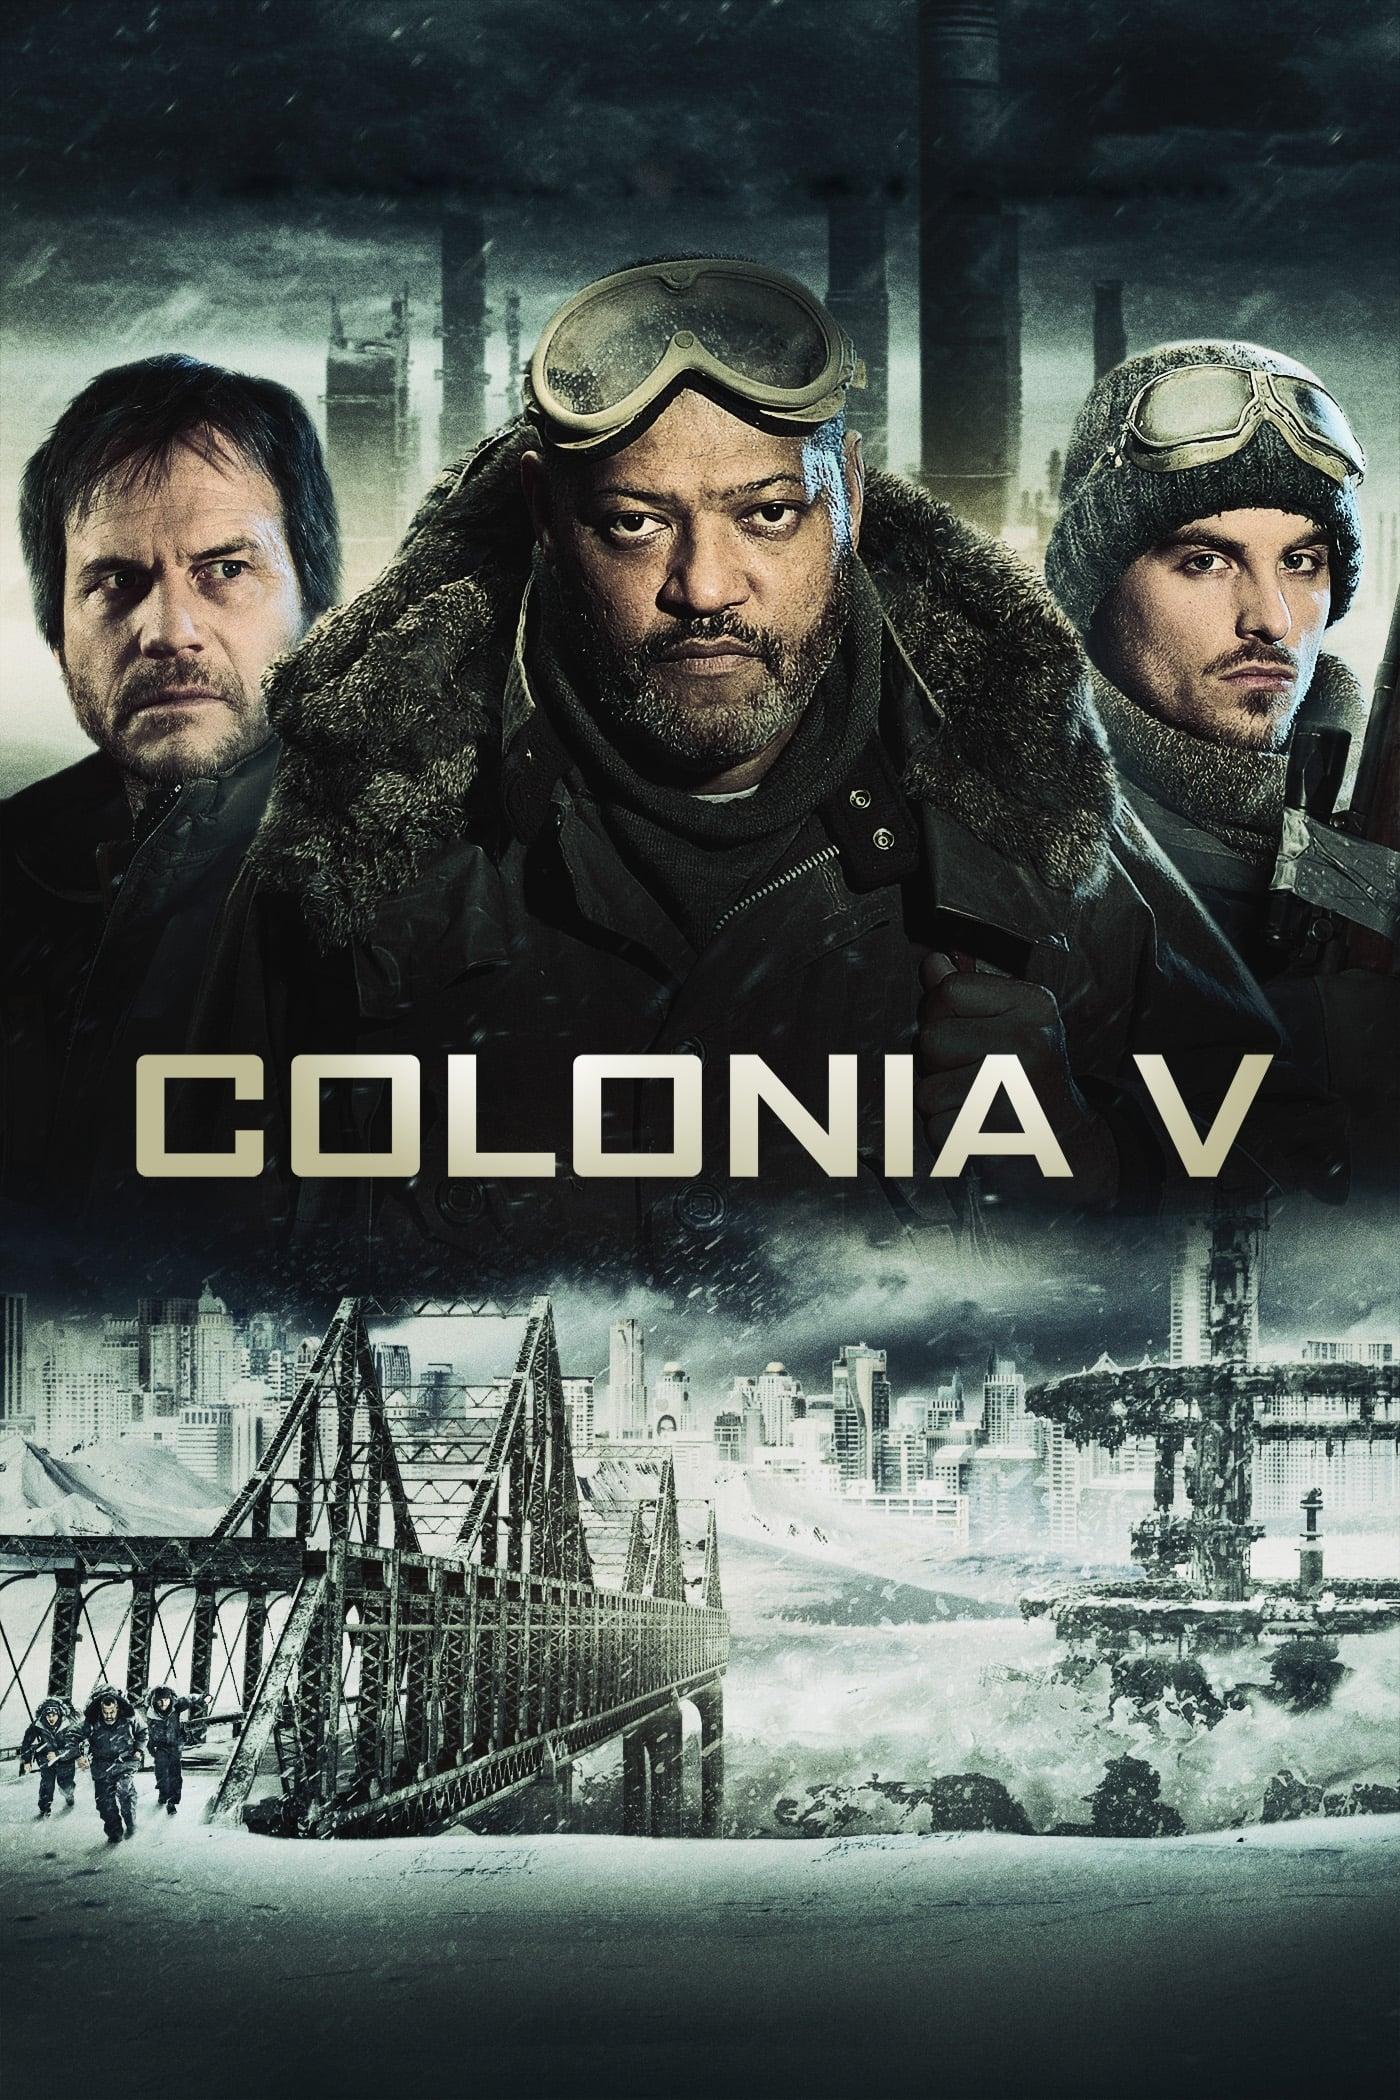 Colonia V poster